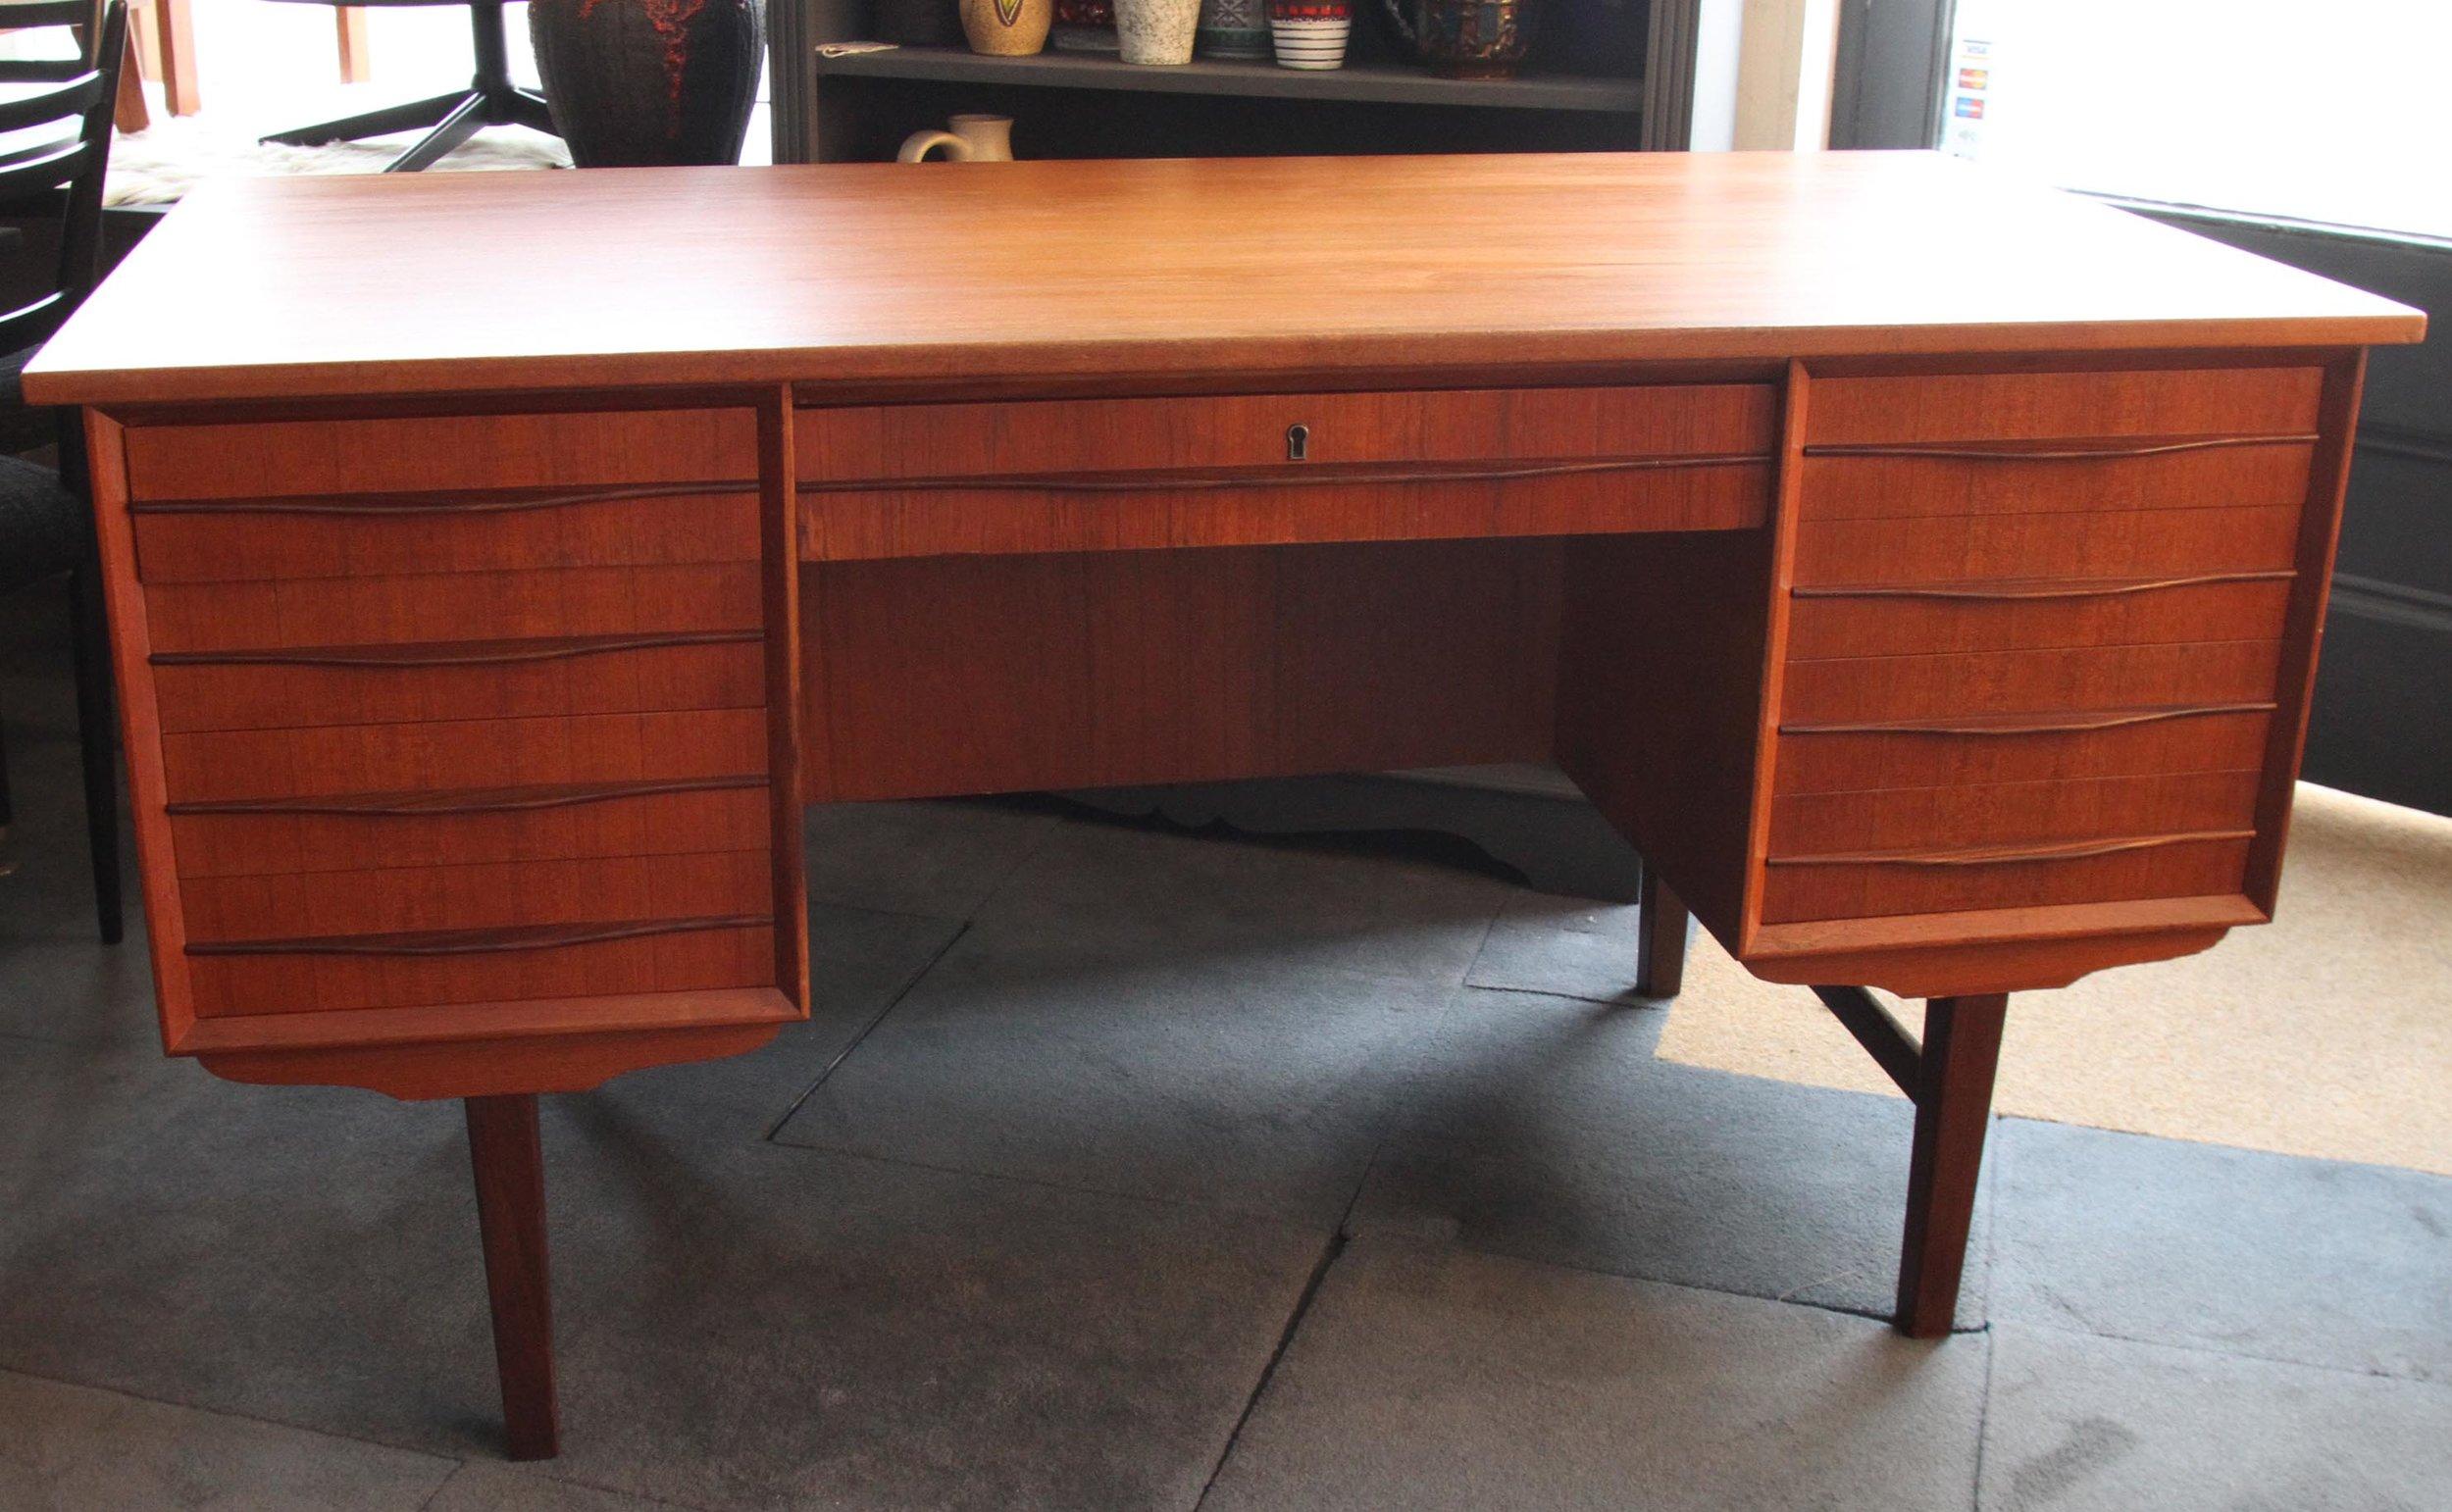 Teak Desk by Kofod Larsen £875